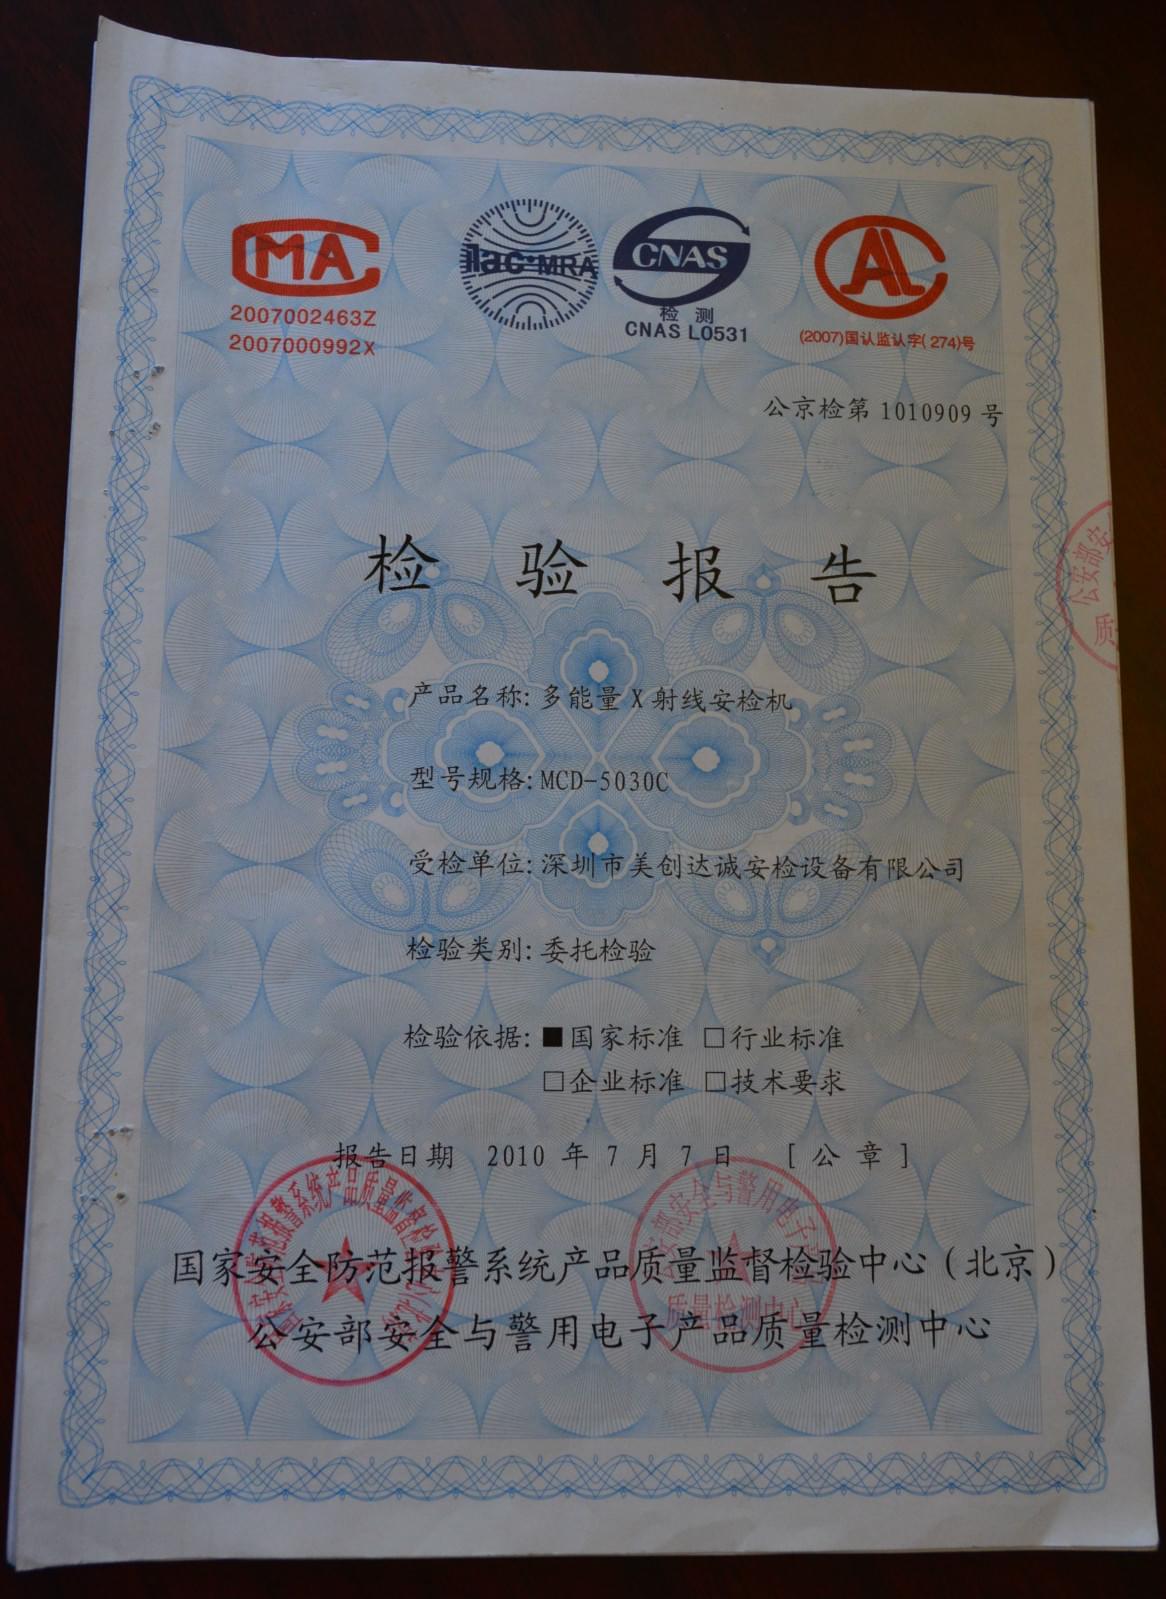 X光机5030C质检报告封面